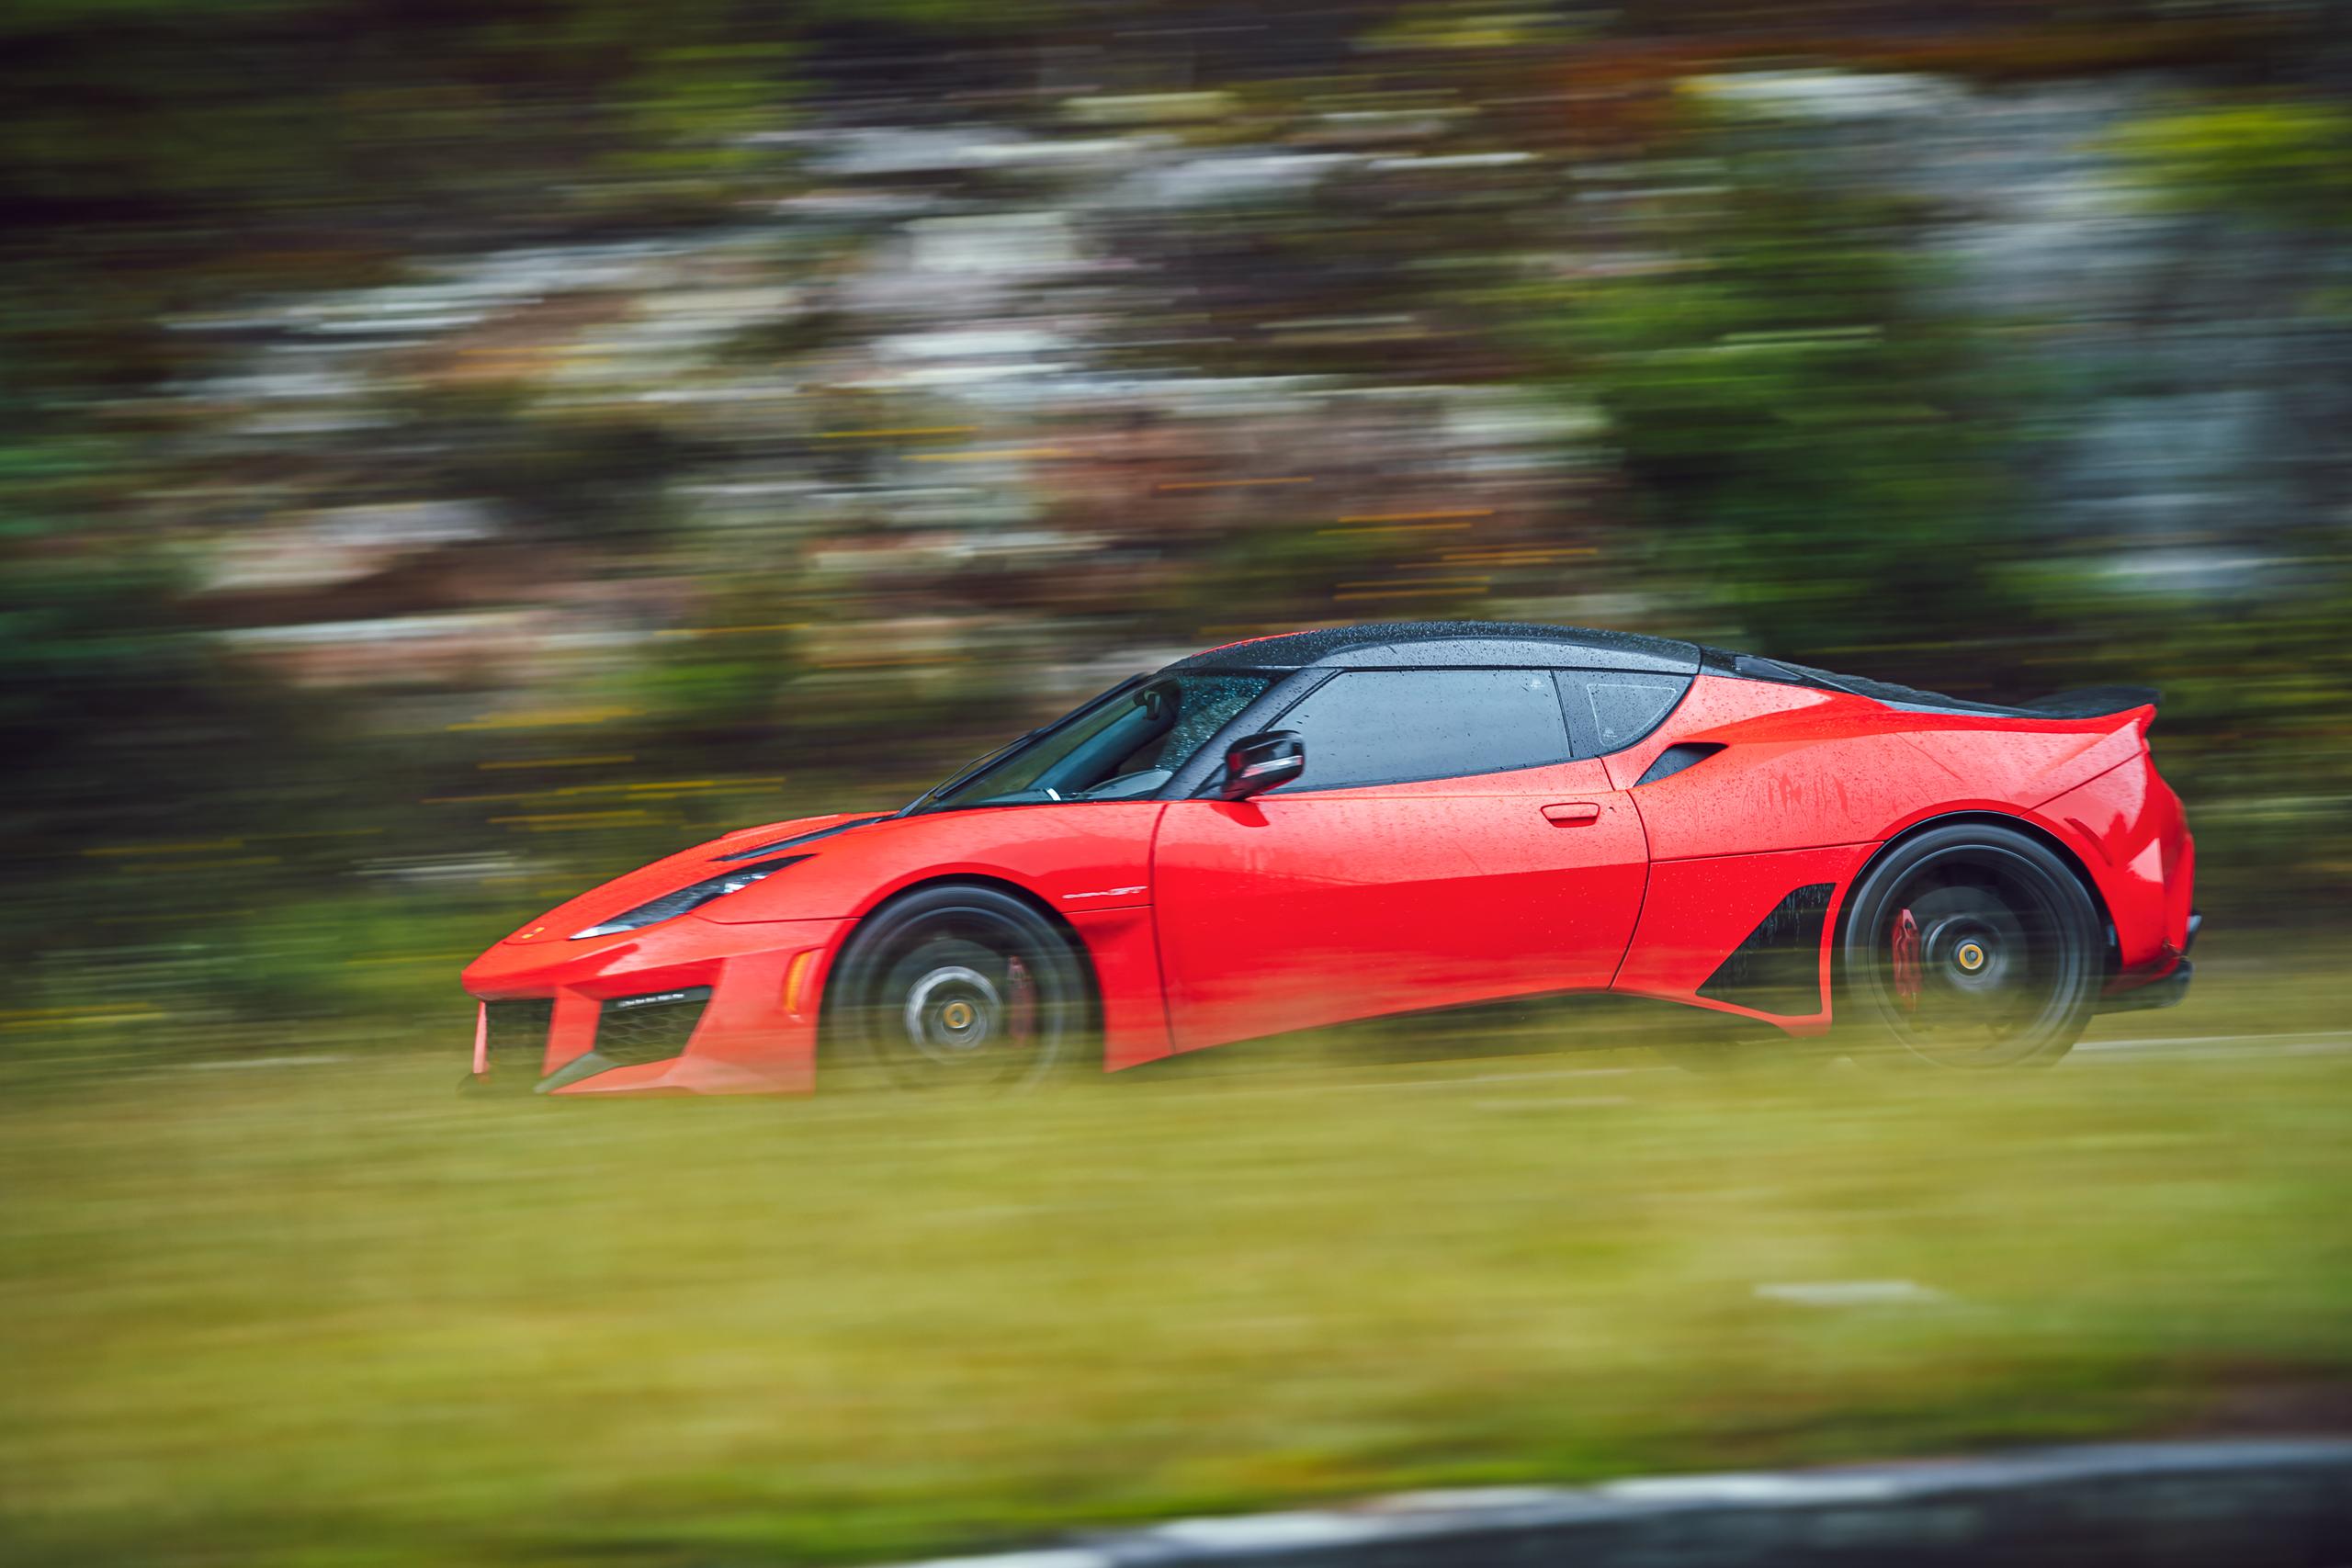 Lotus Evora GT side profile action